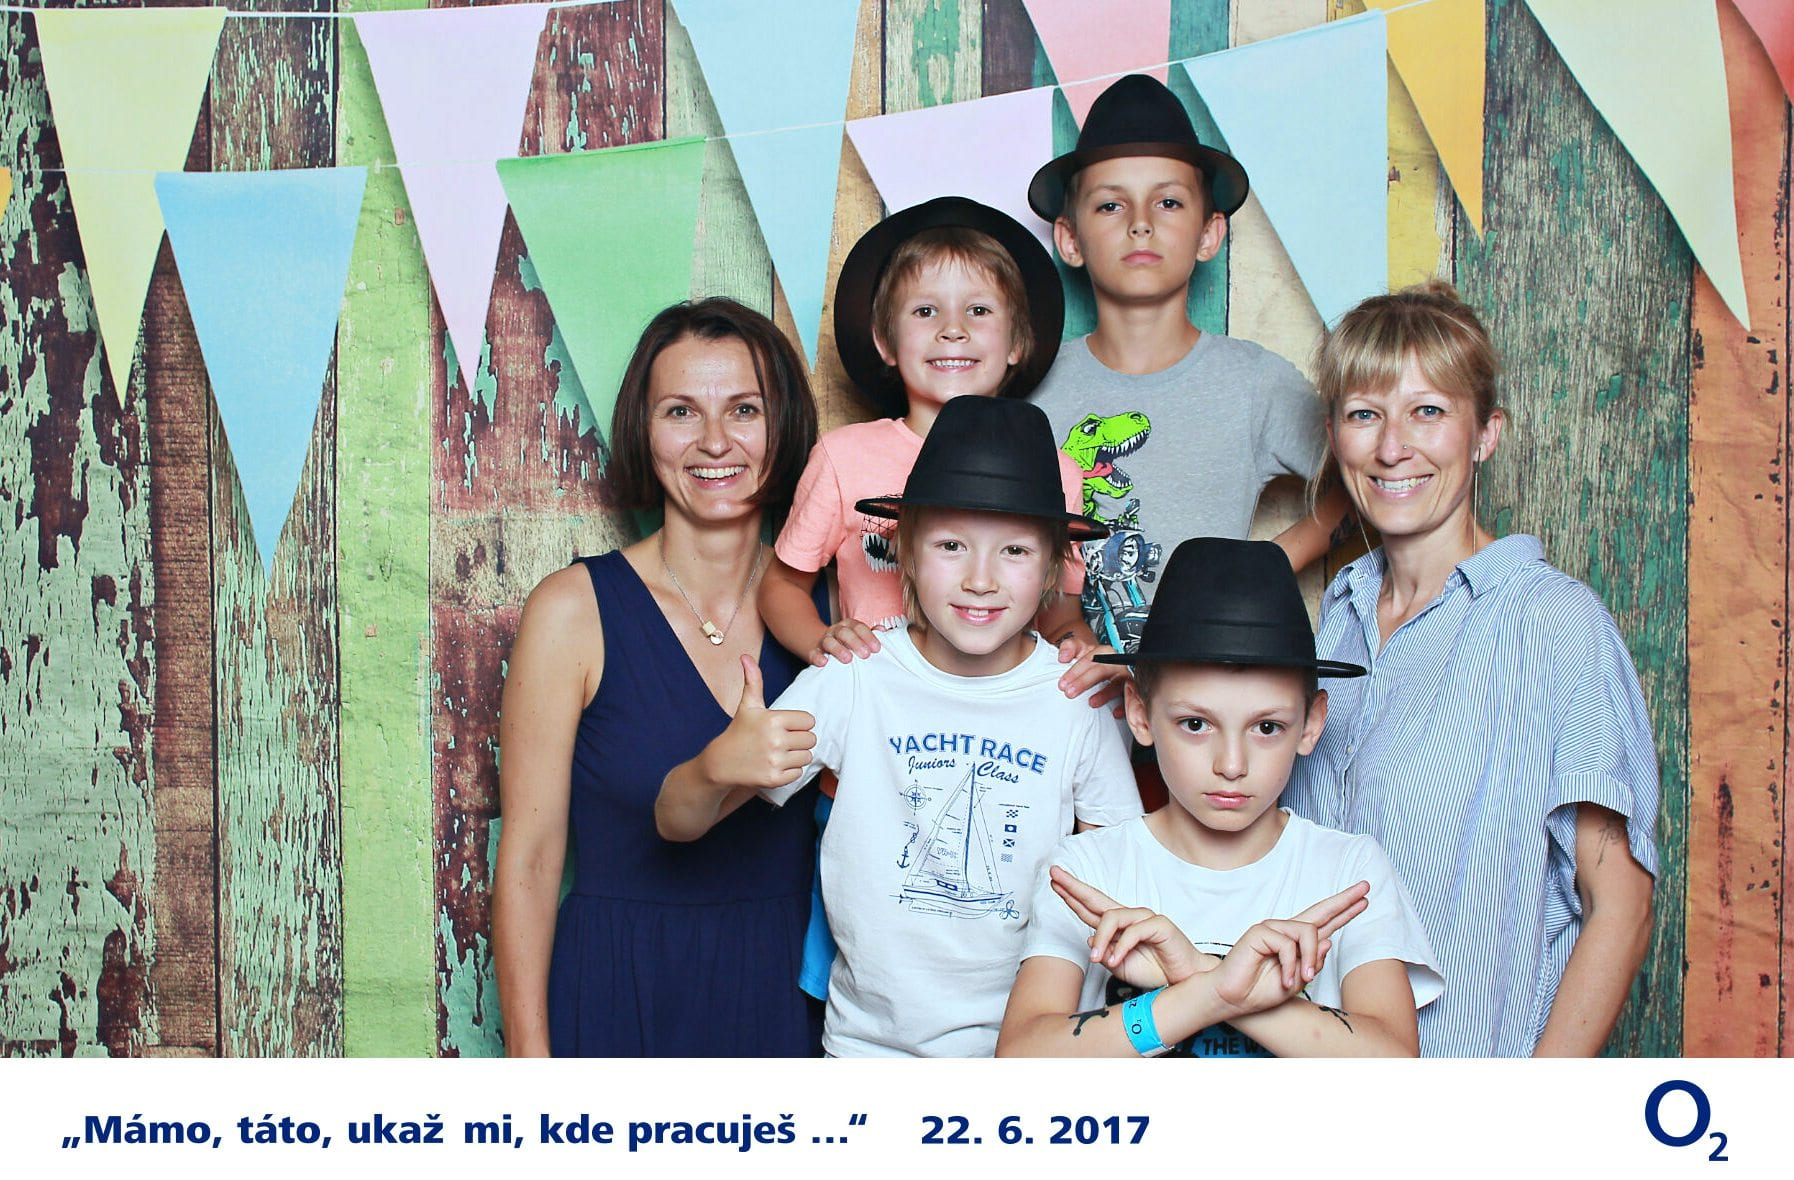 fotokoutek-o2-22-6-2017-273286